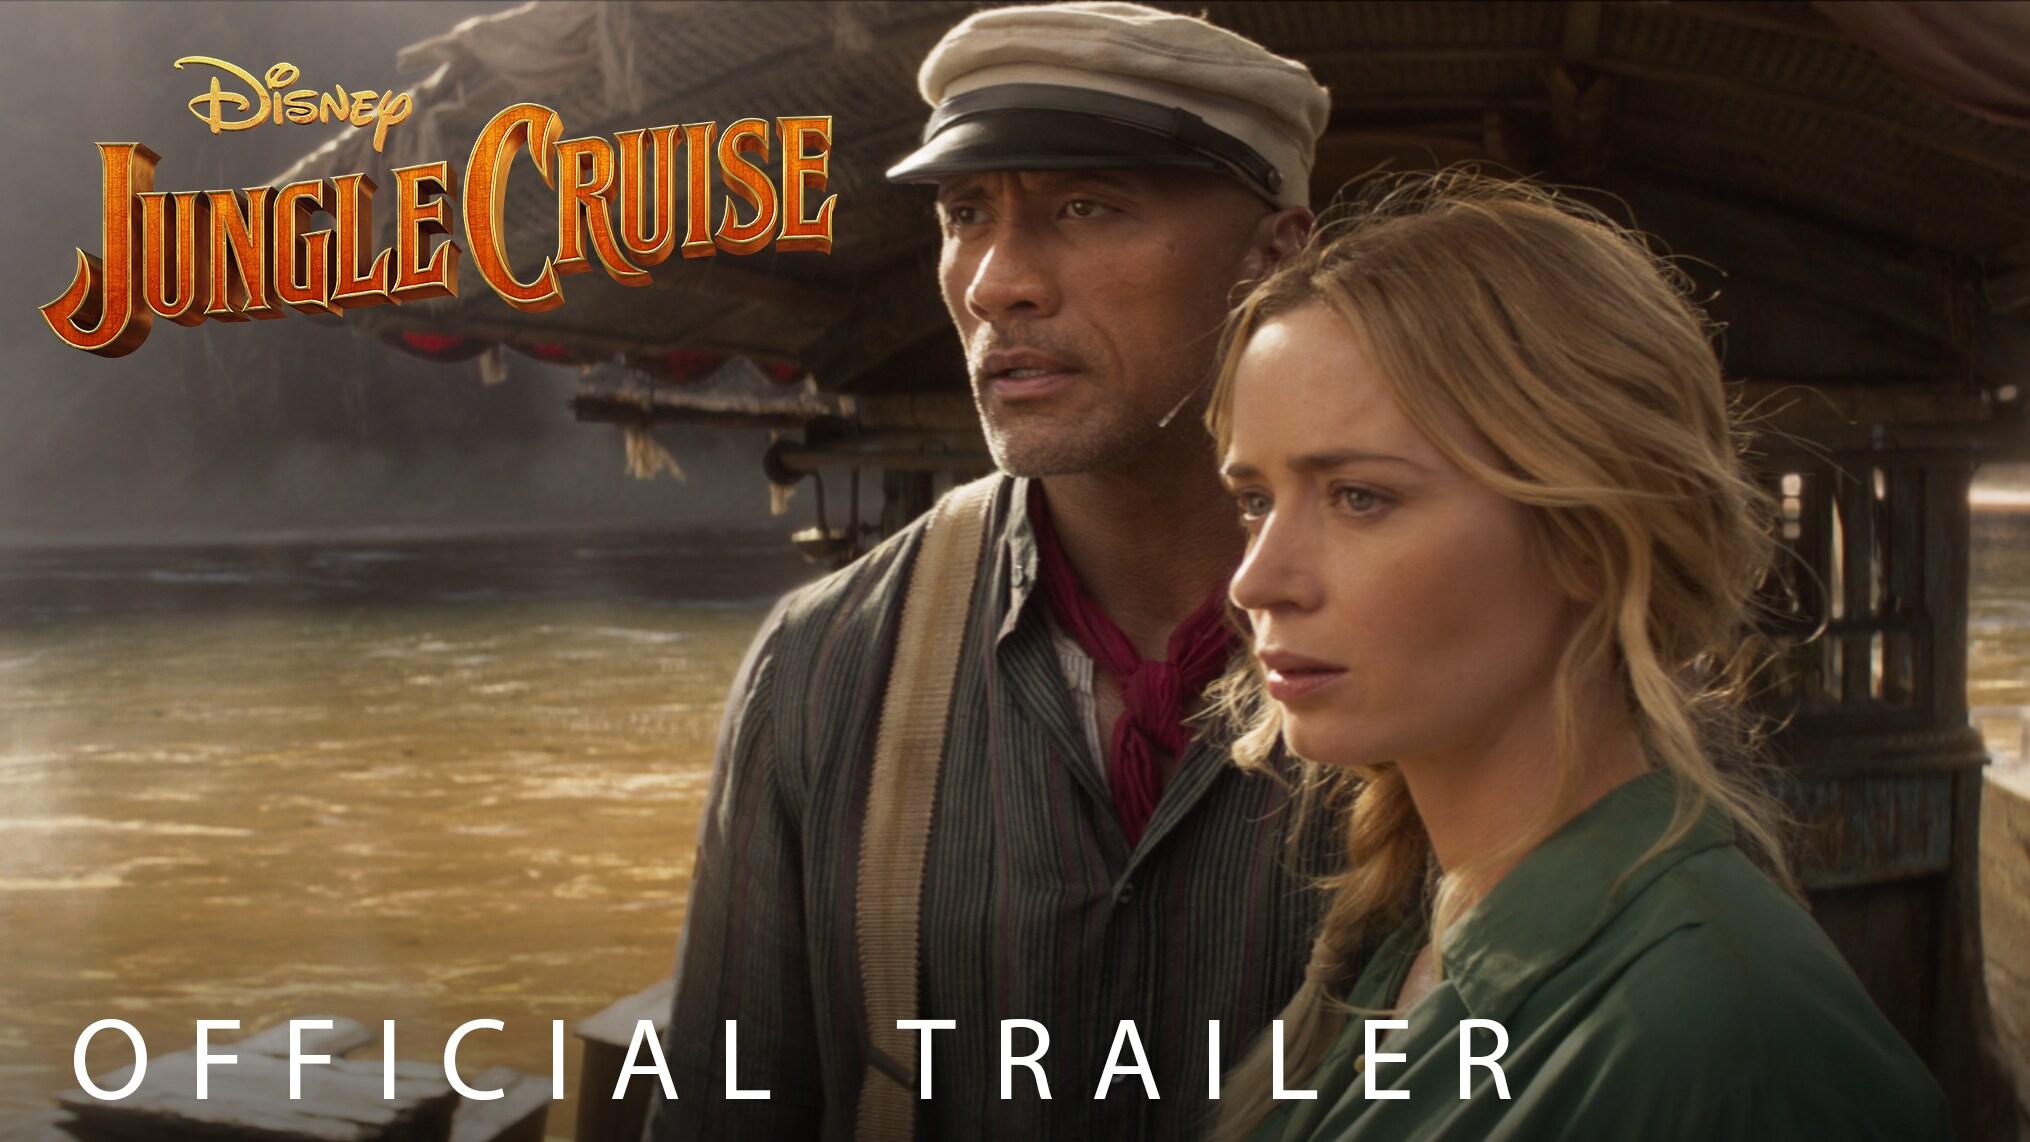 Disney's Jungle Cruise – New Trailer